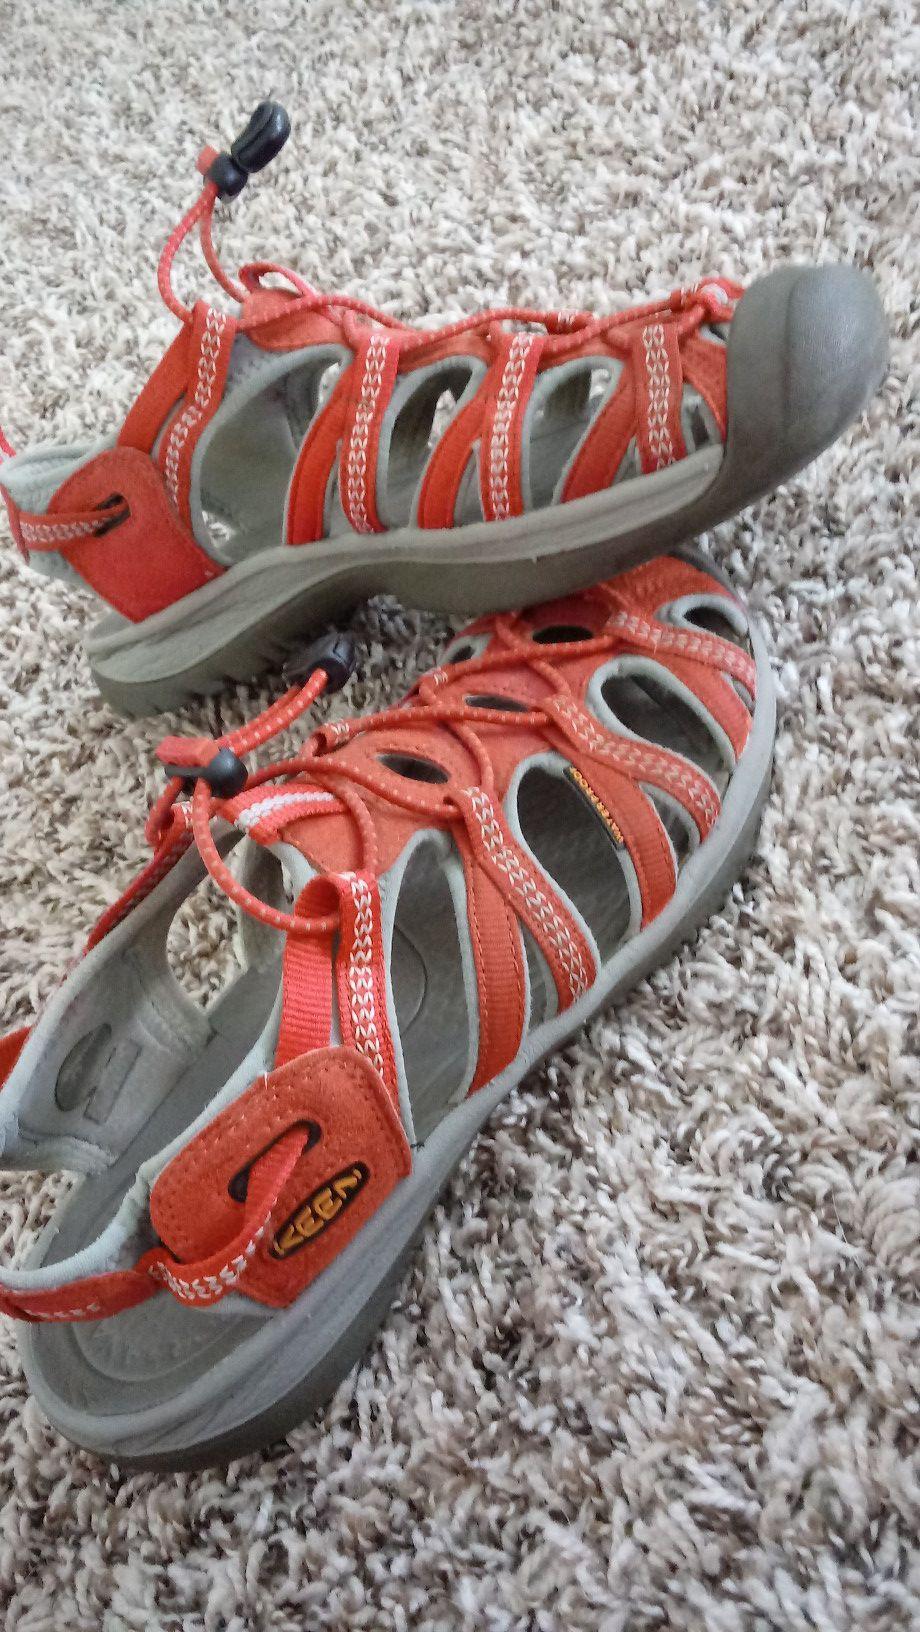 Red & Grey Keen Sandals Women's size 8.5 adjustable